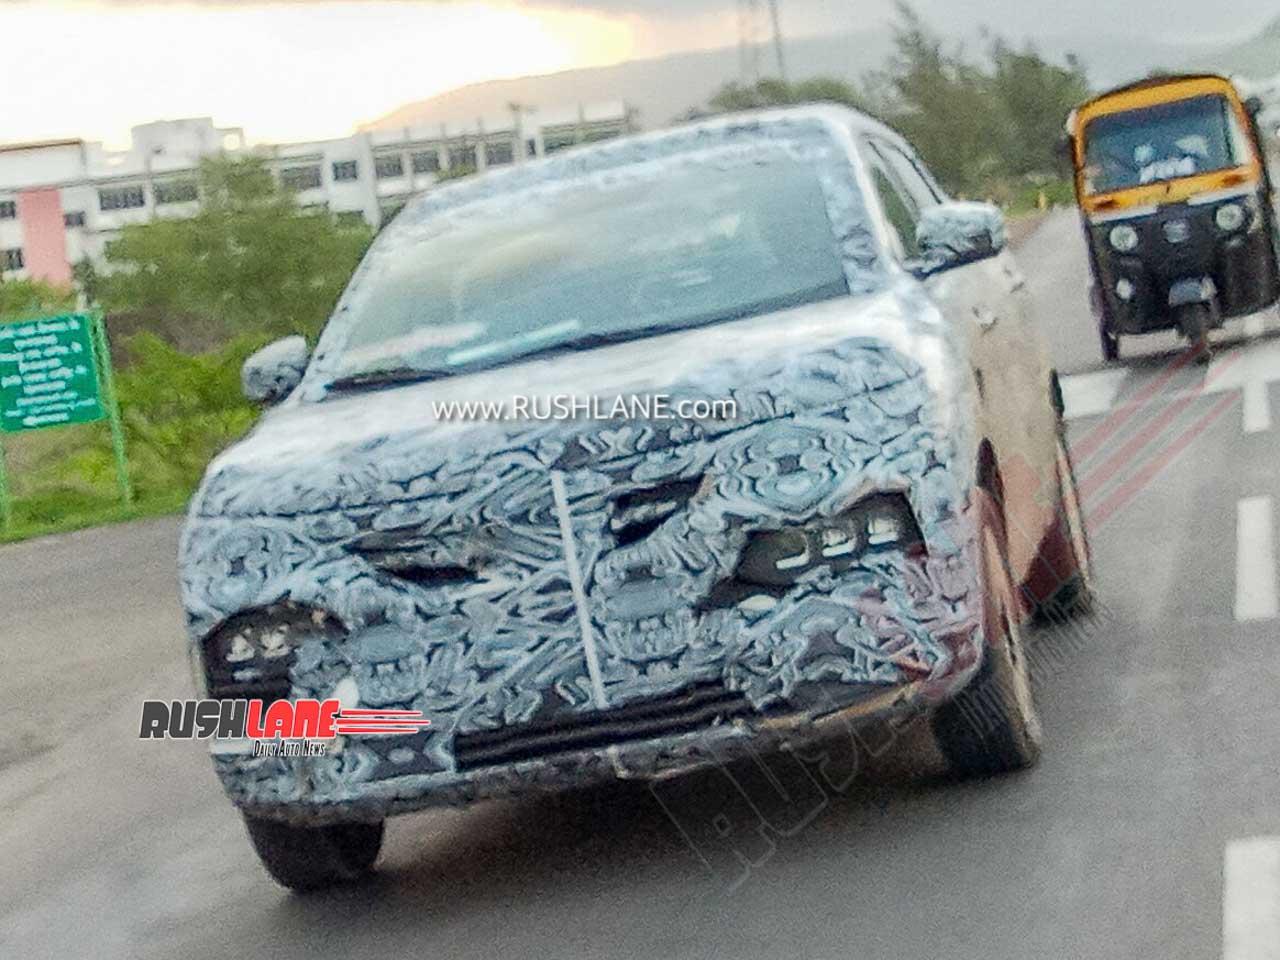 Renault Kiger sub 4m SUV spied testing on Mumbai Pune old highway